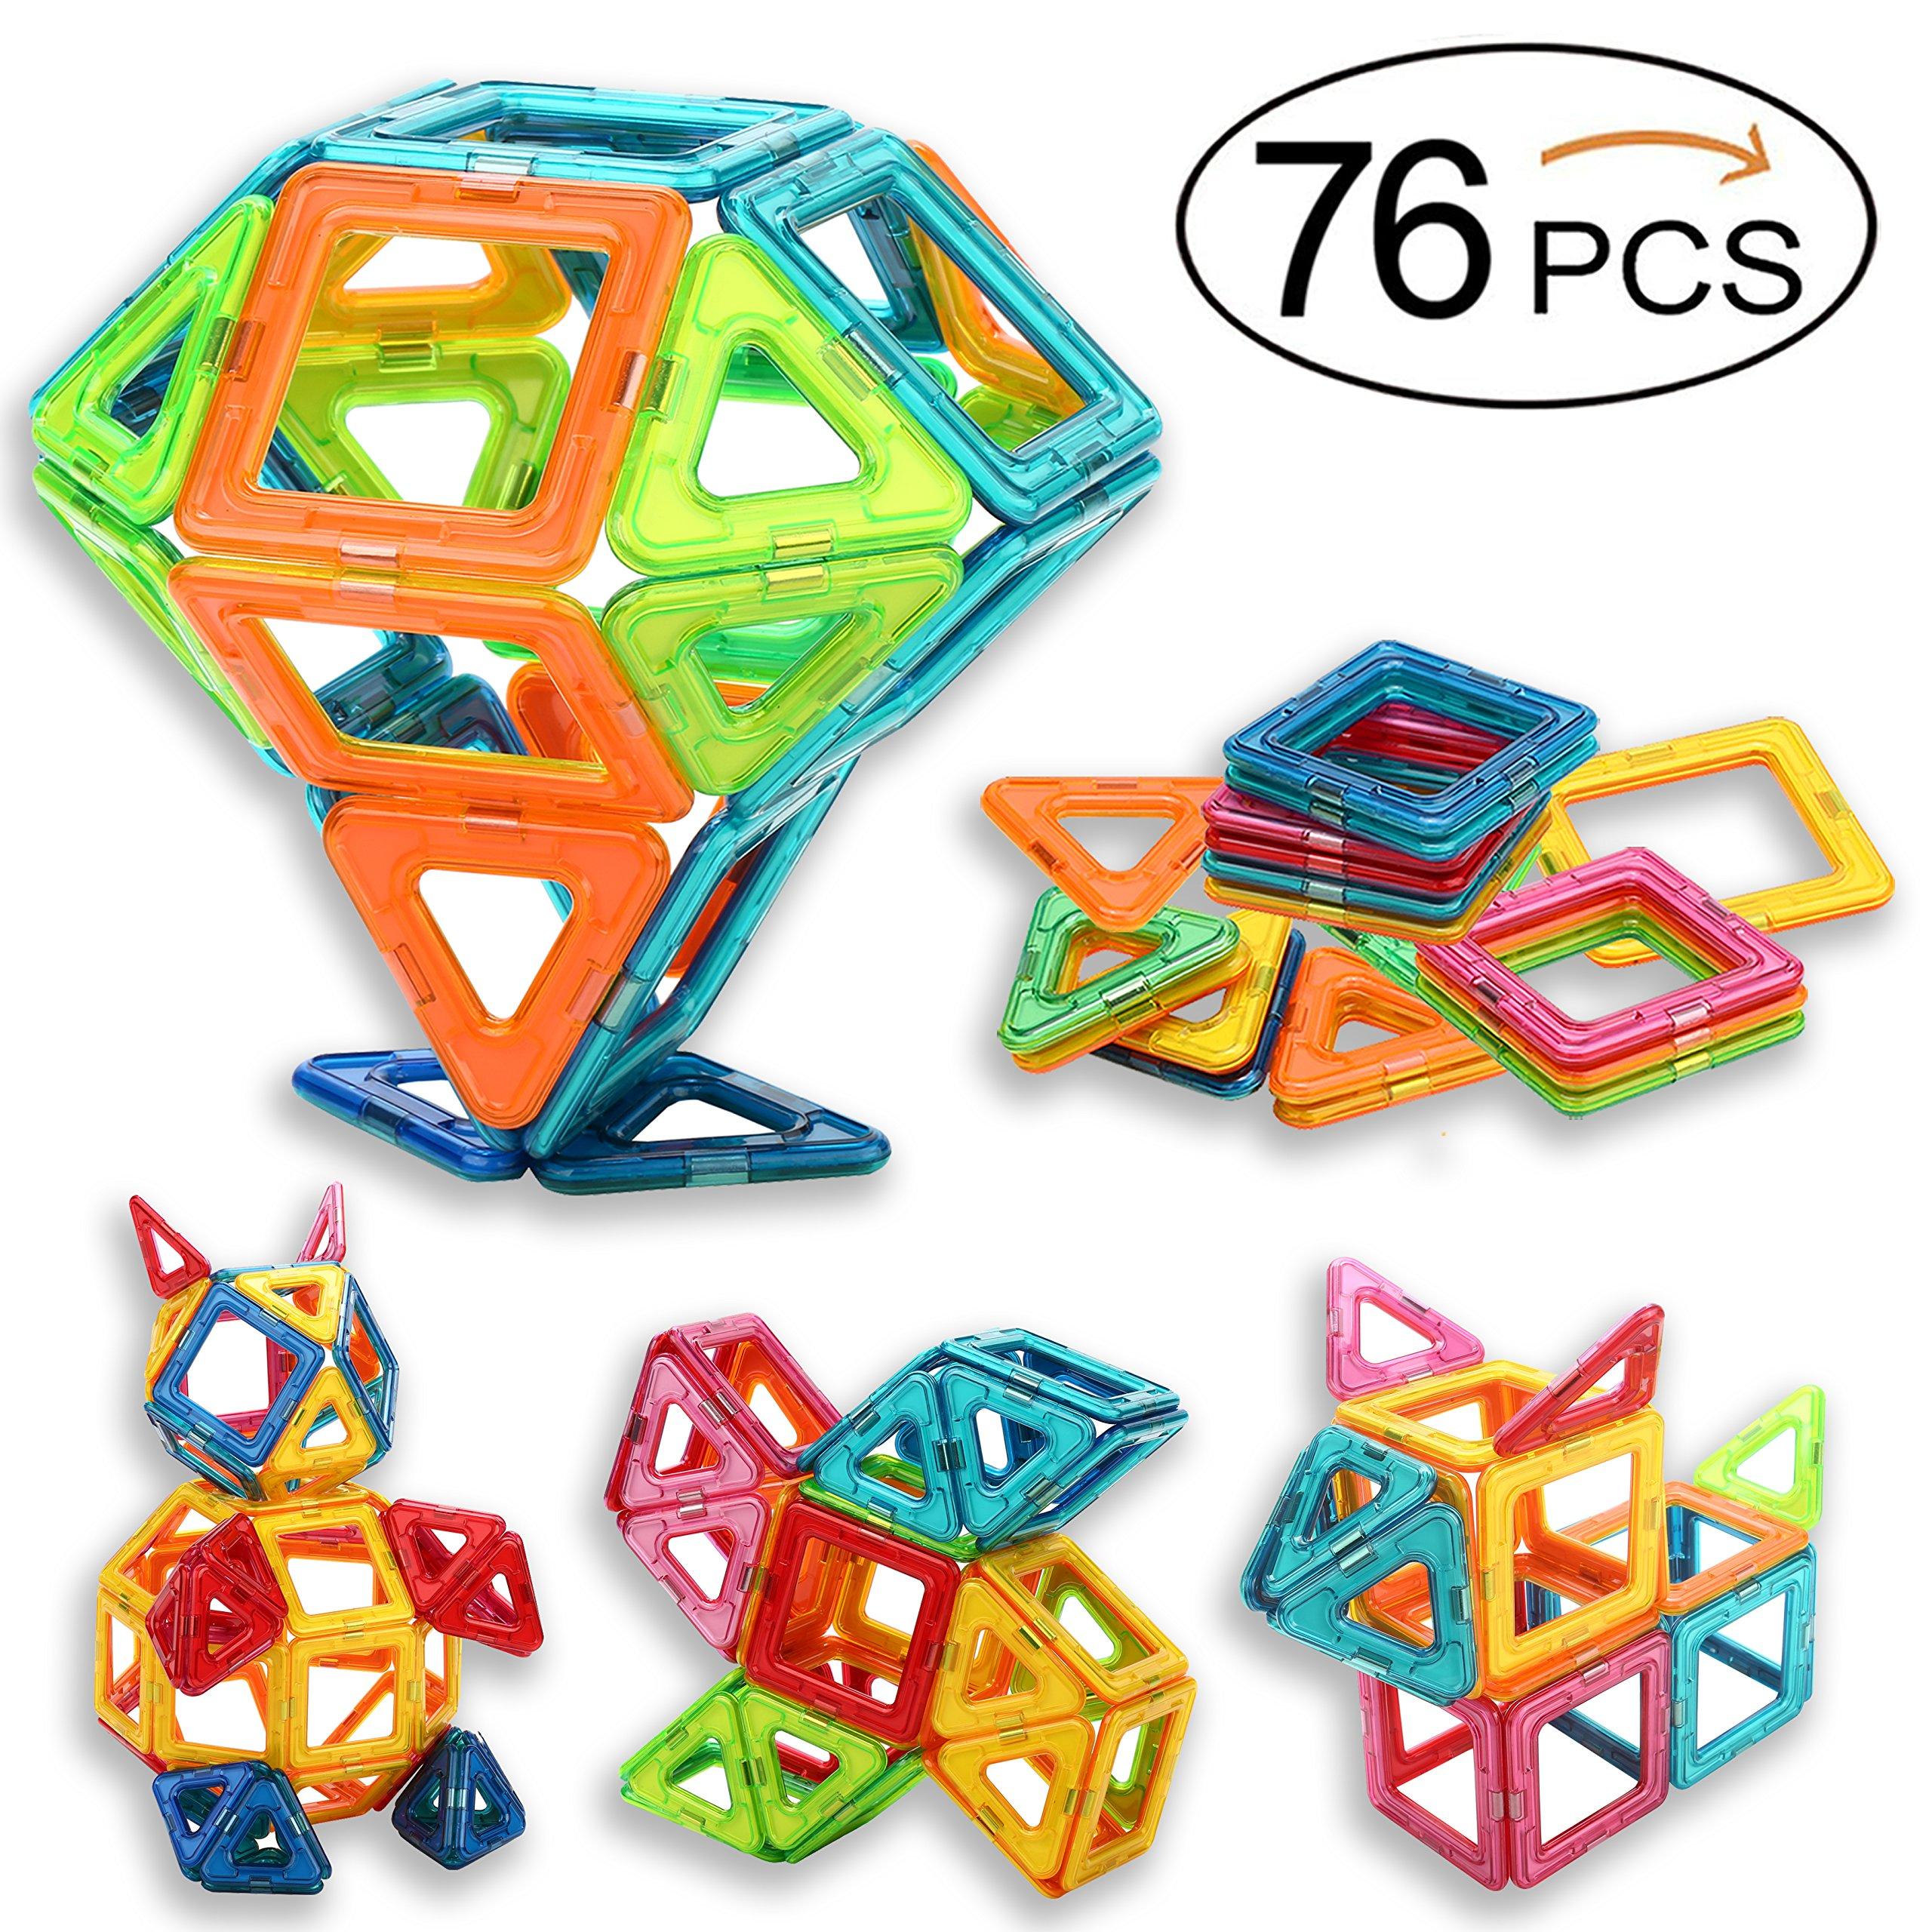 Sunwing Magnetic Building Blocks 76PCS Magnet Toy Set for kids, Magnets Tiles STEM Toys for Boys and Girls